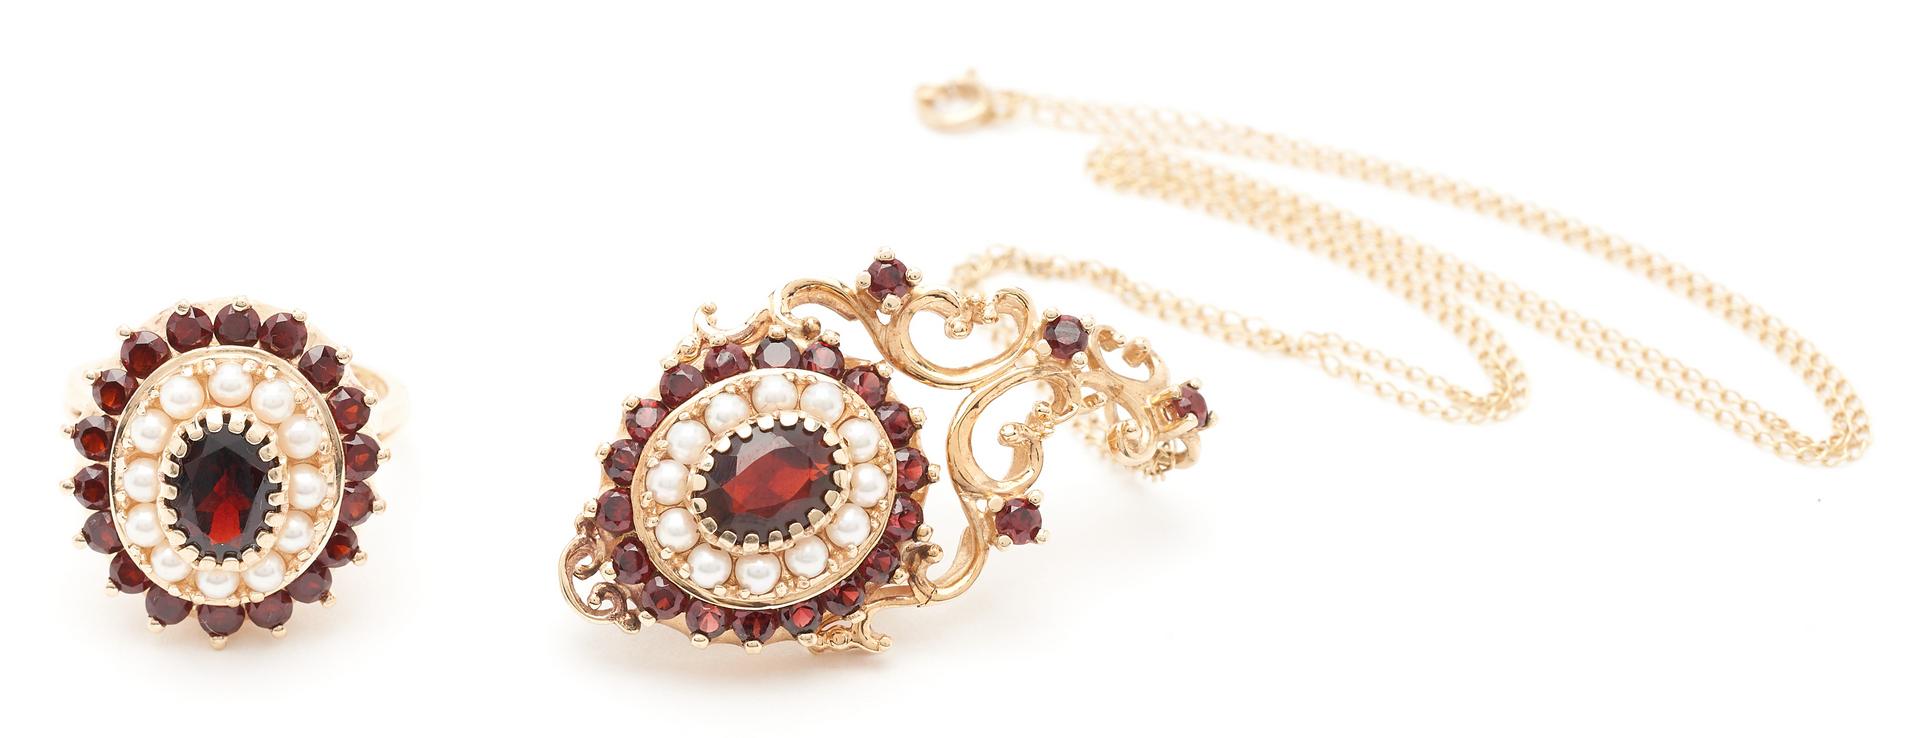 Lot 1215: Ladies 10K Gold, Garnet & Gold Pendant & Ring, 2 items